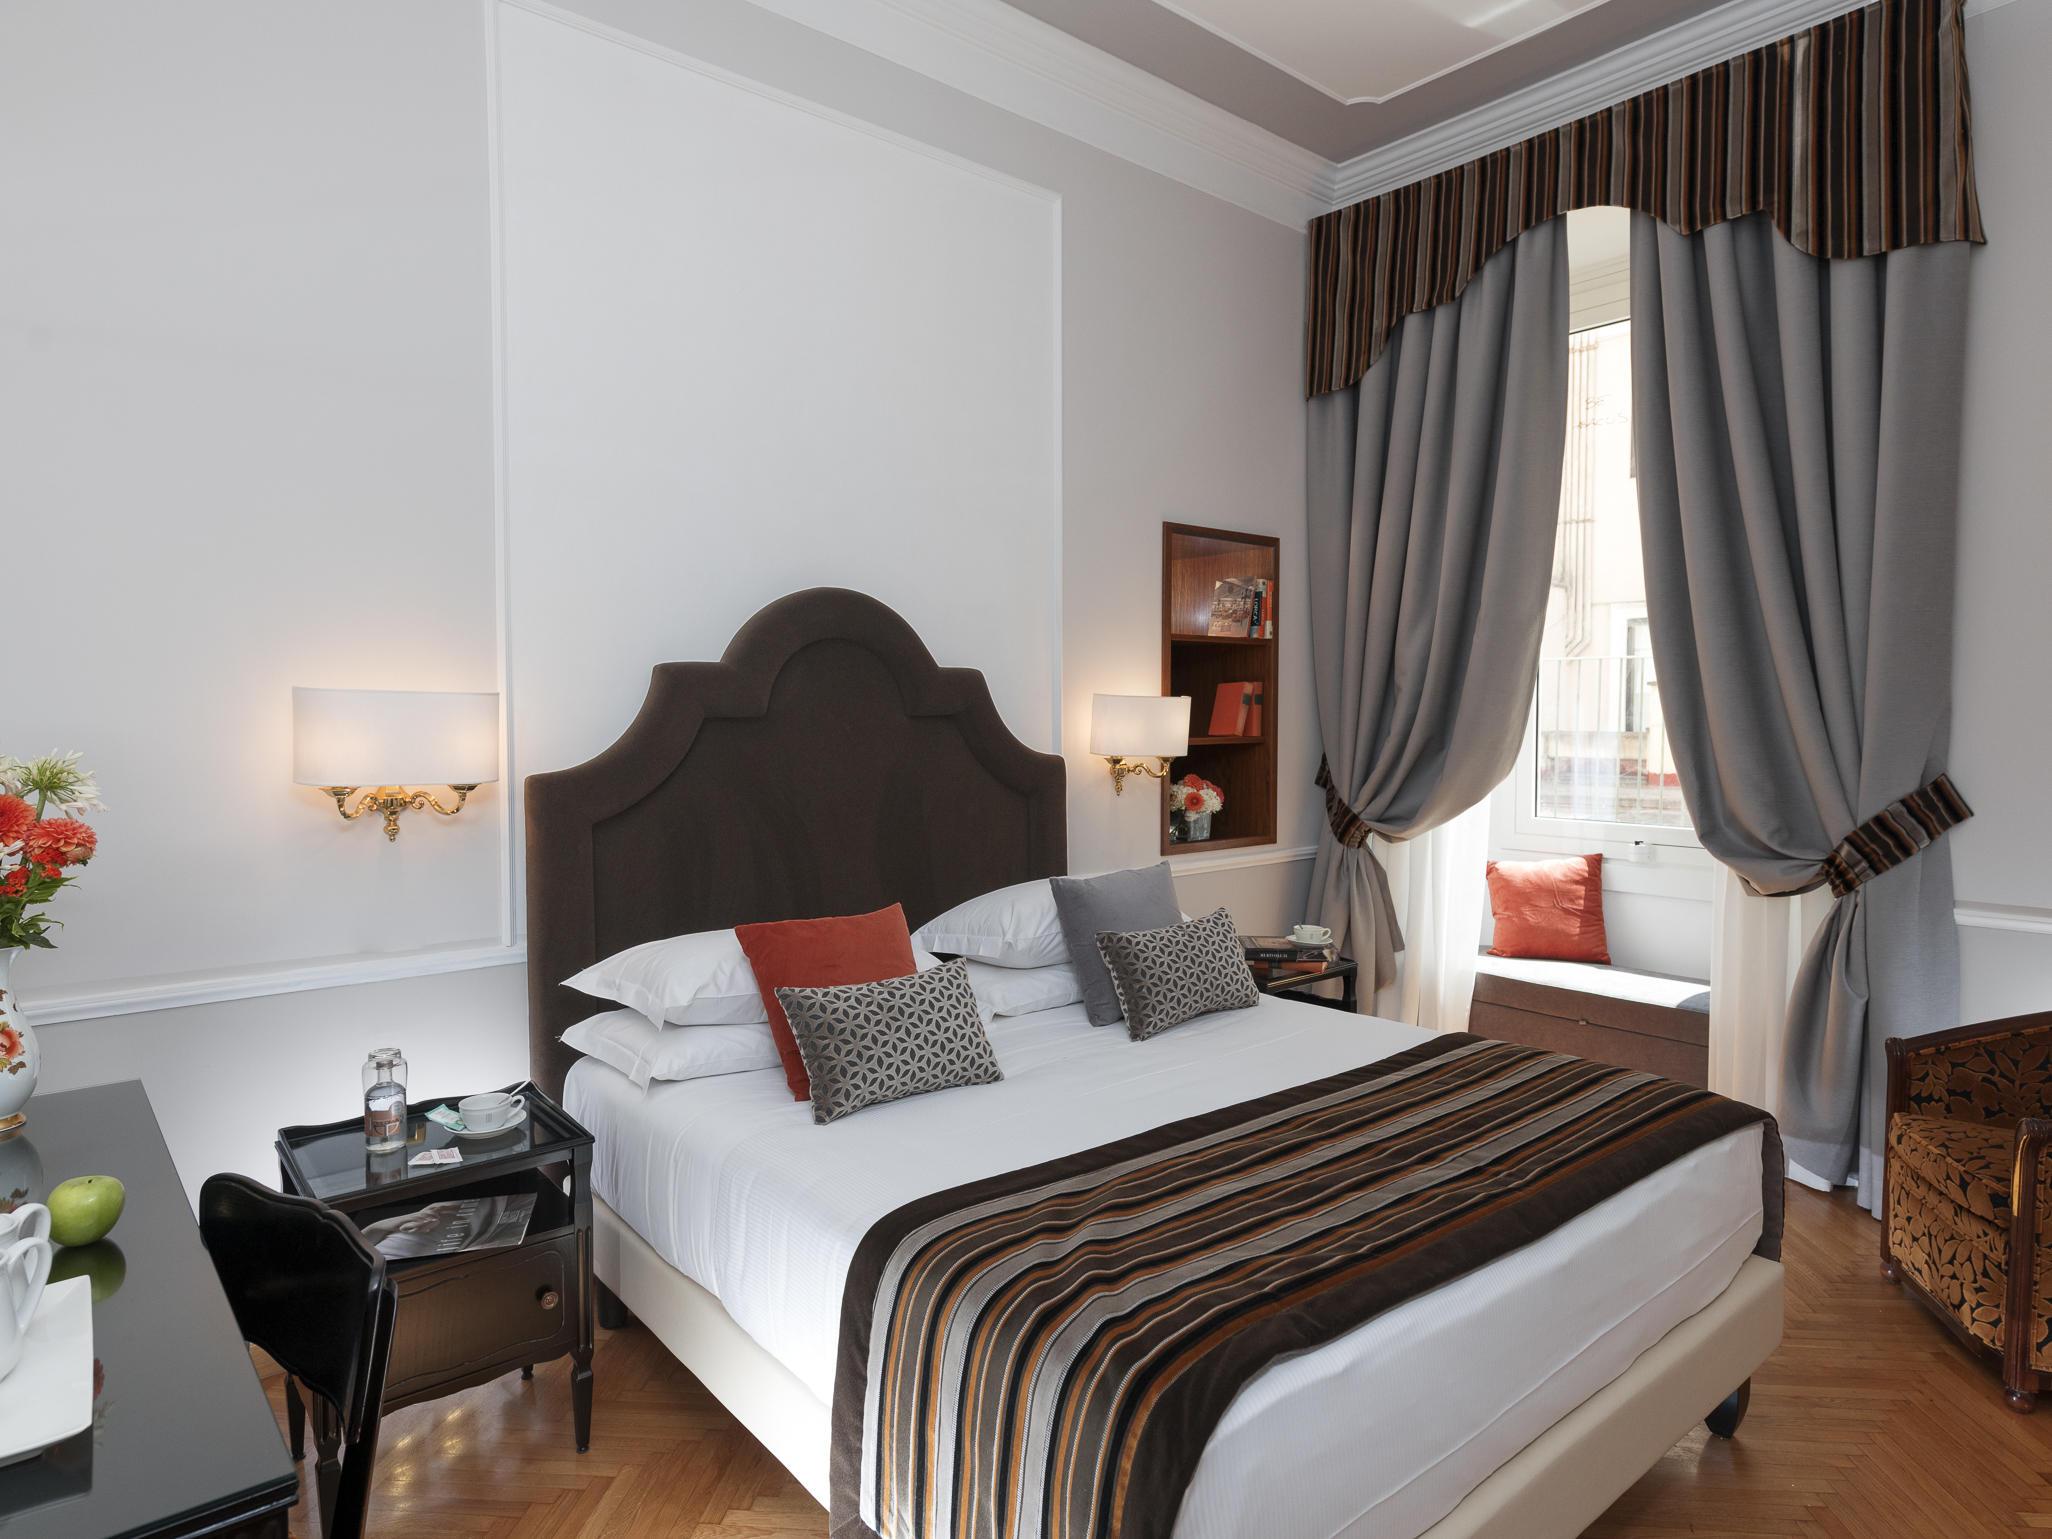 Camera Premium Deluxe Bettoja Hotels